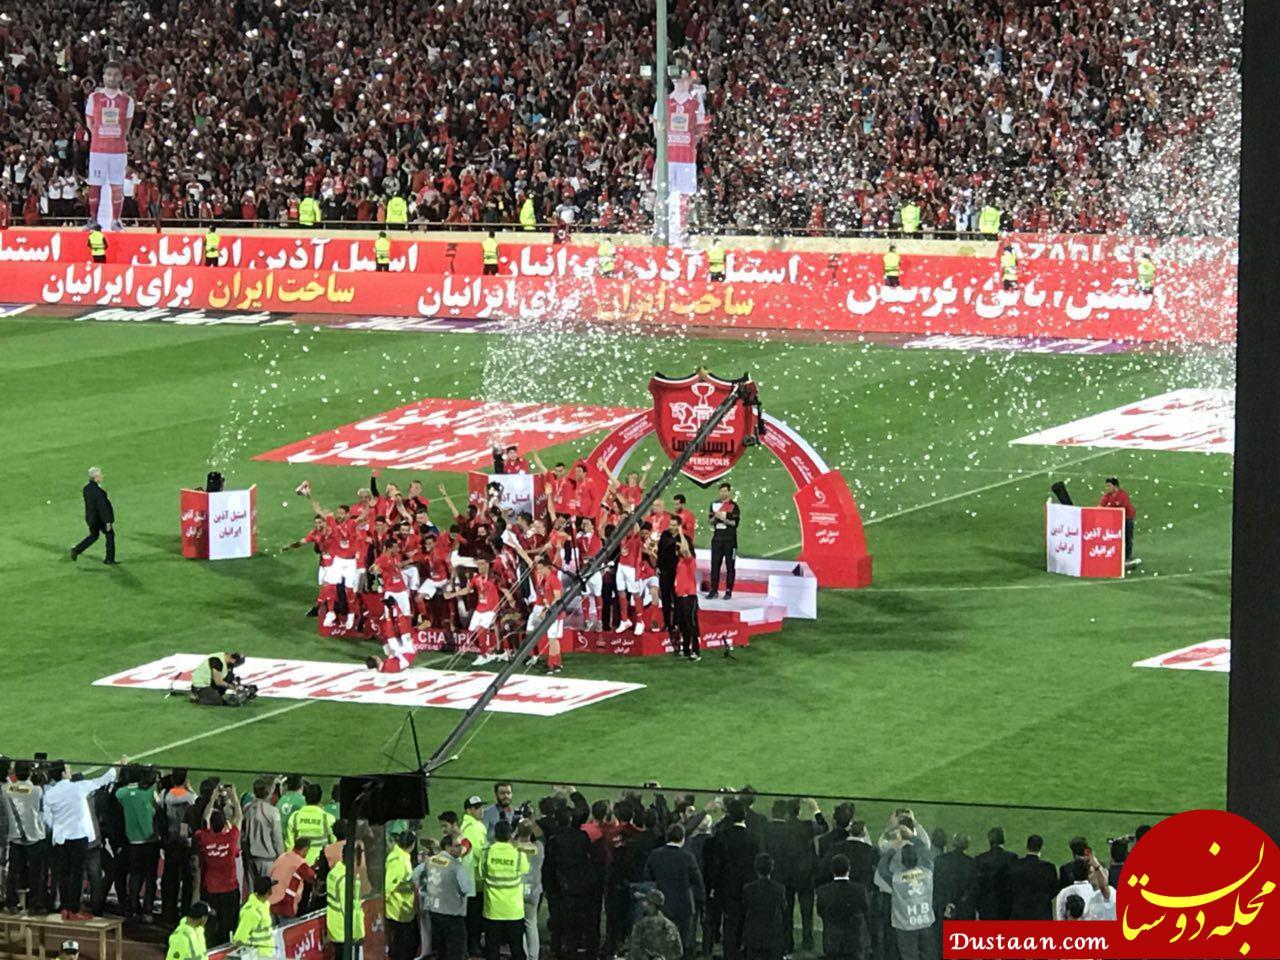 www.dustaan.com لحظه بالا بردن جام قهرمانی سرخپوشان توسط هانی نوروزی +فیلم